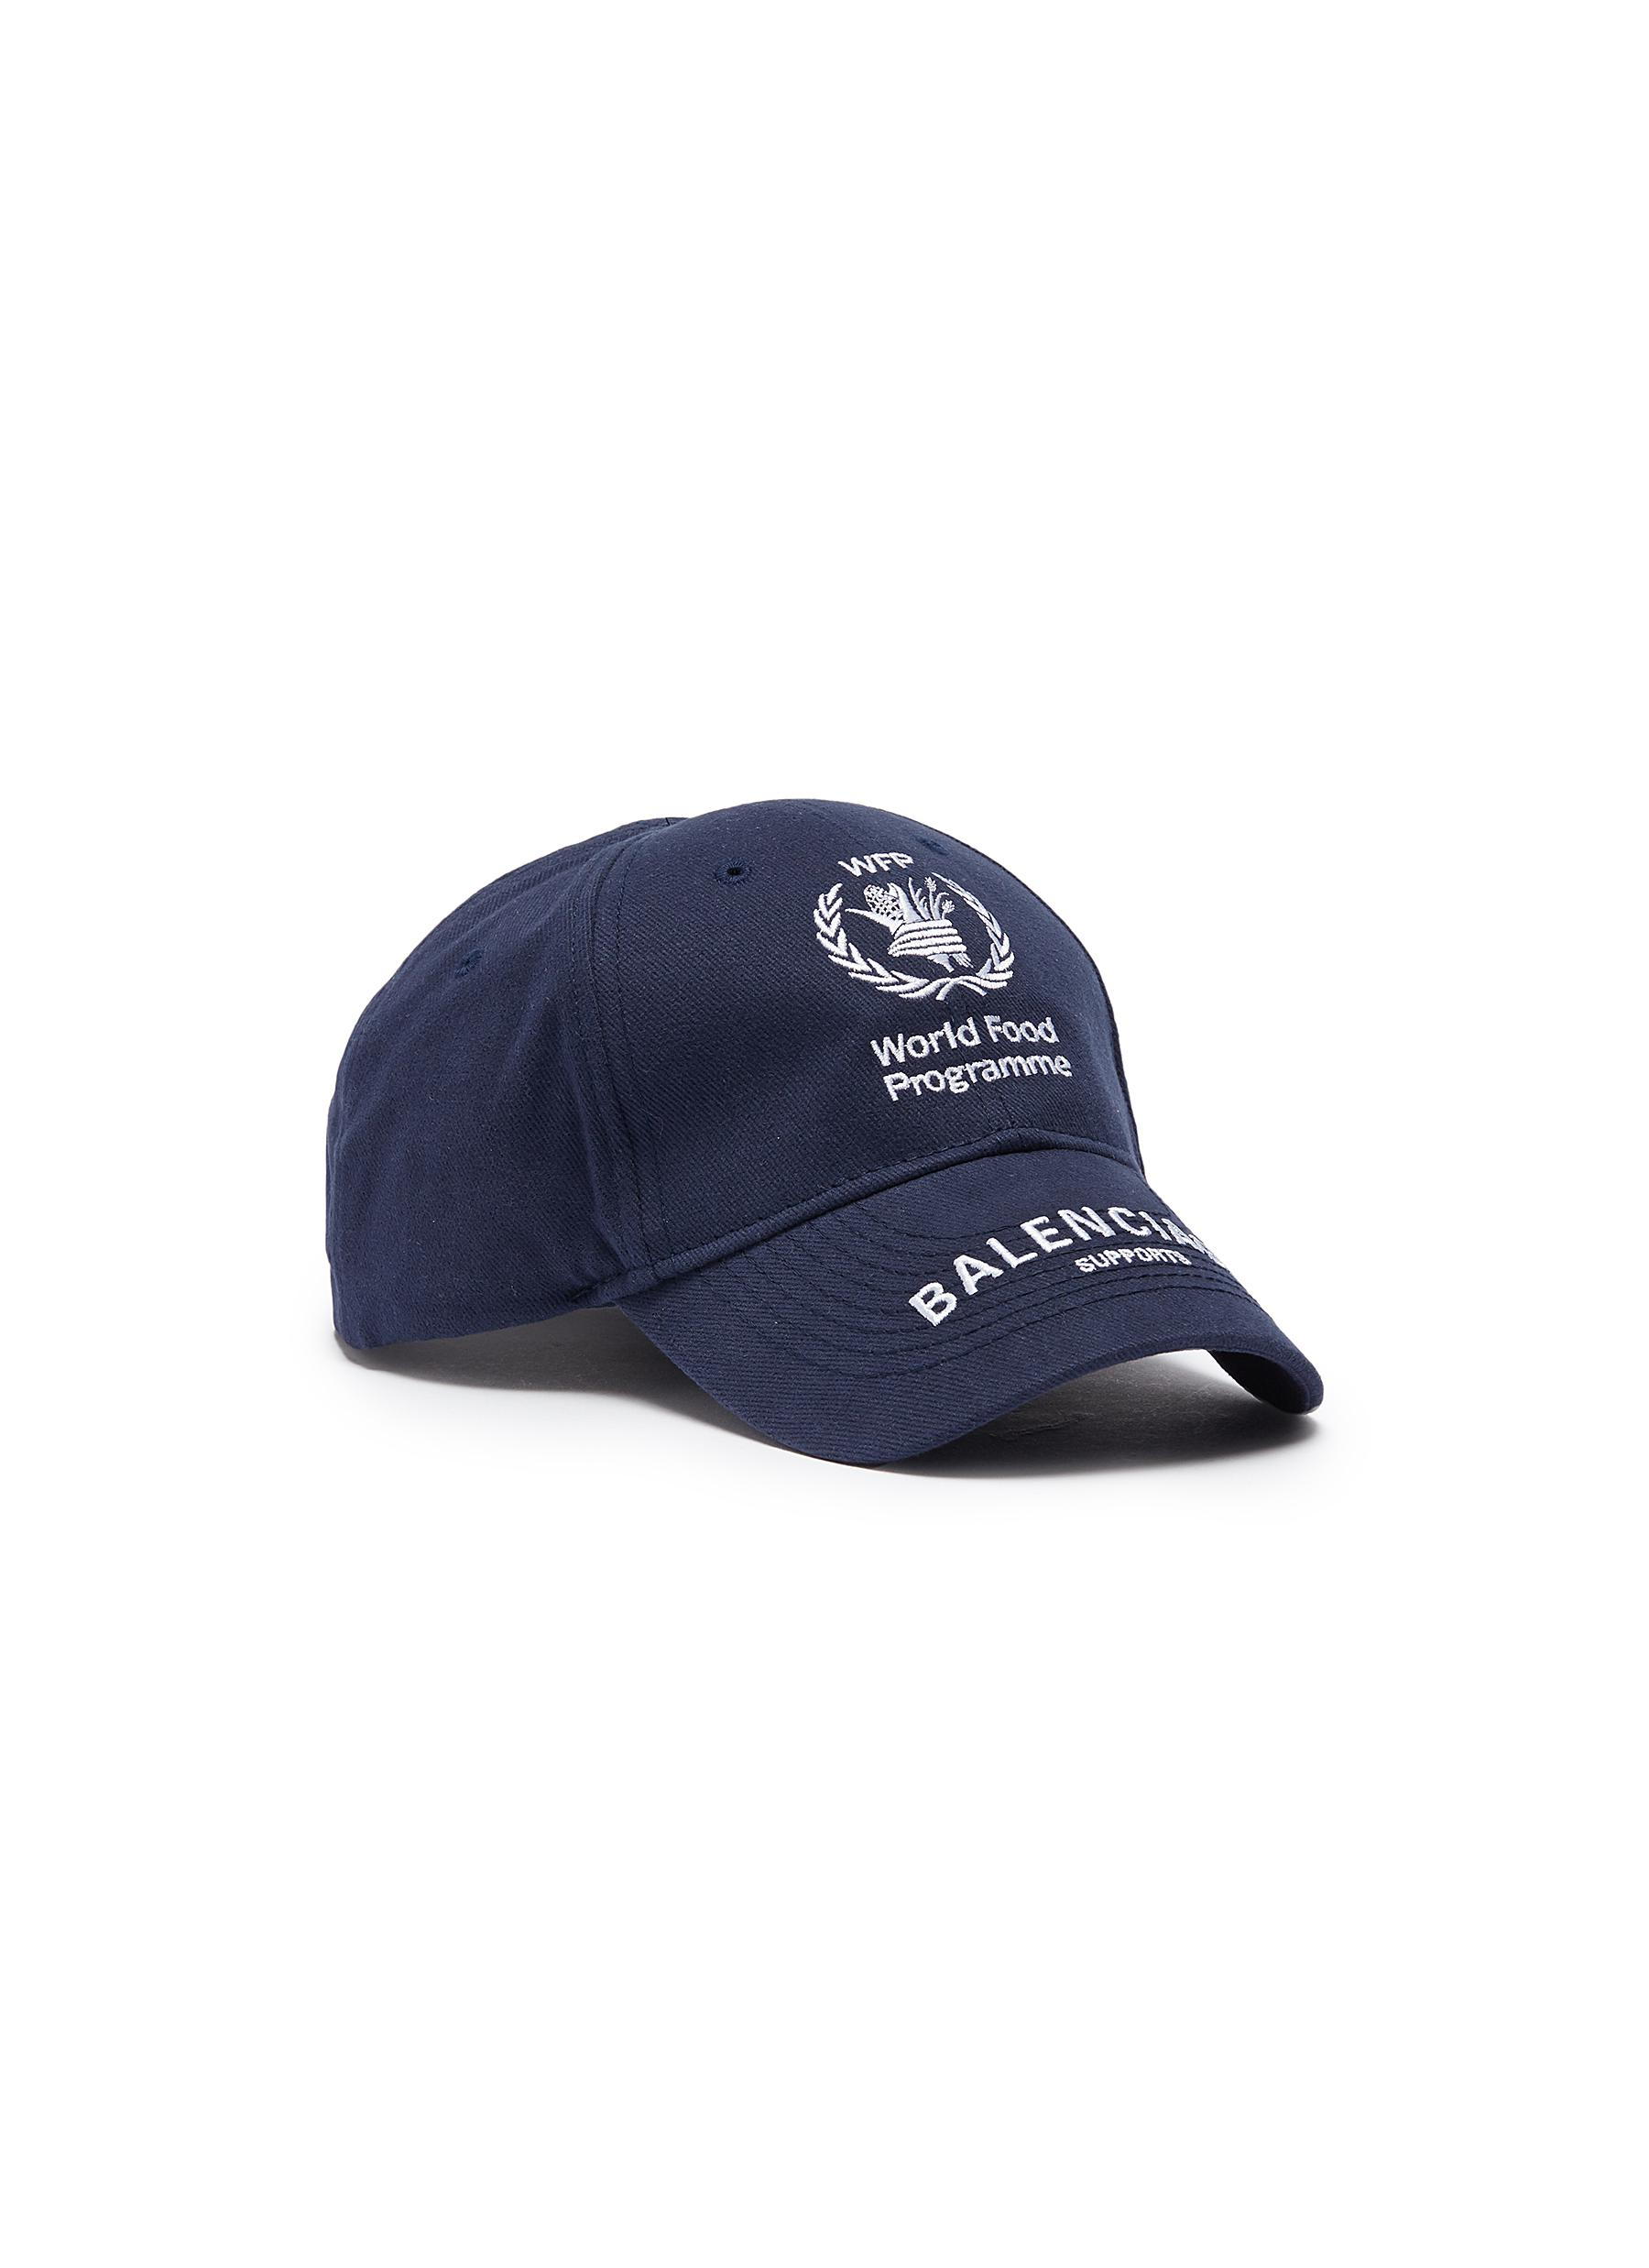 c92eeb15a1b Balenciaga. x World Food Programme logo embroidered baseball cap